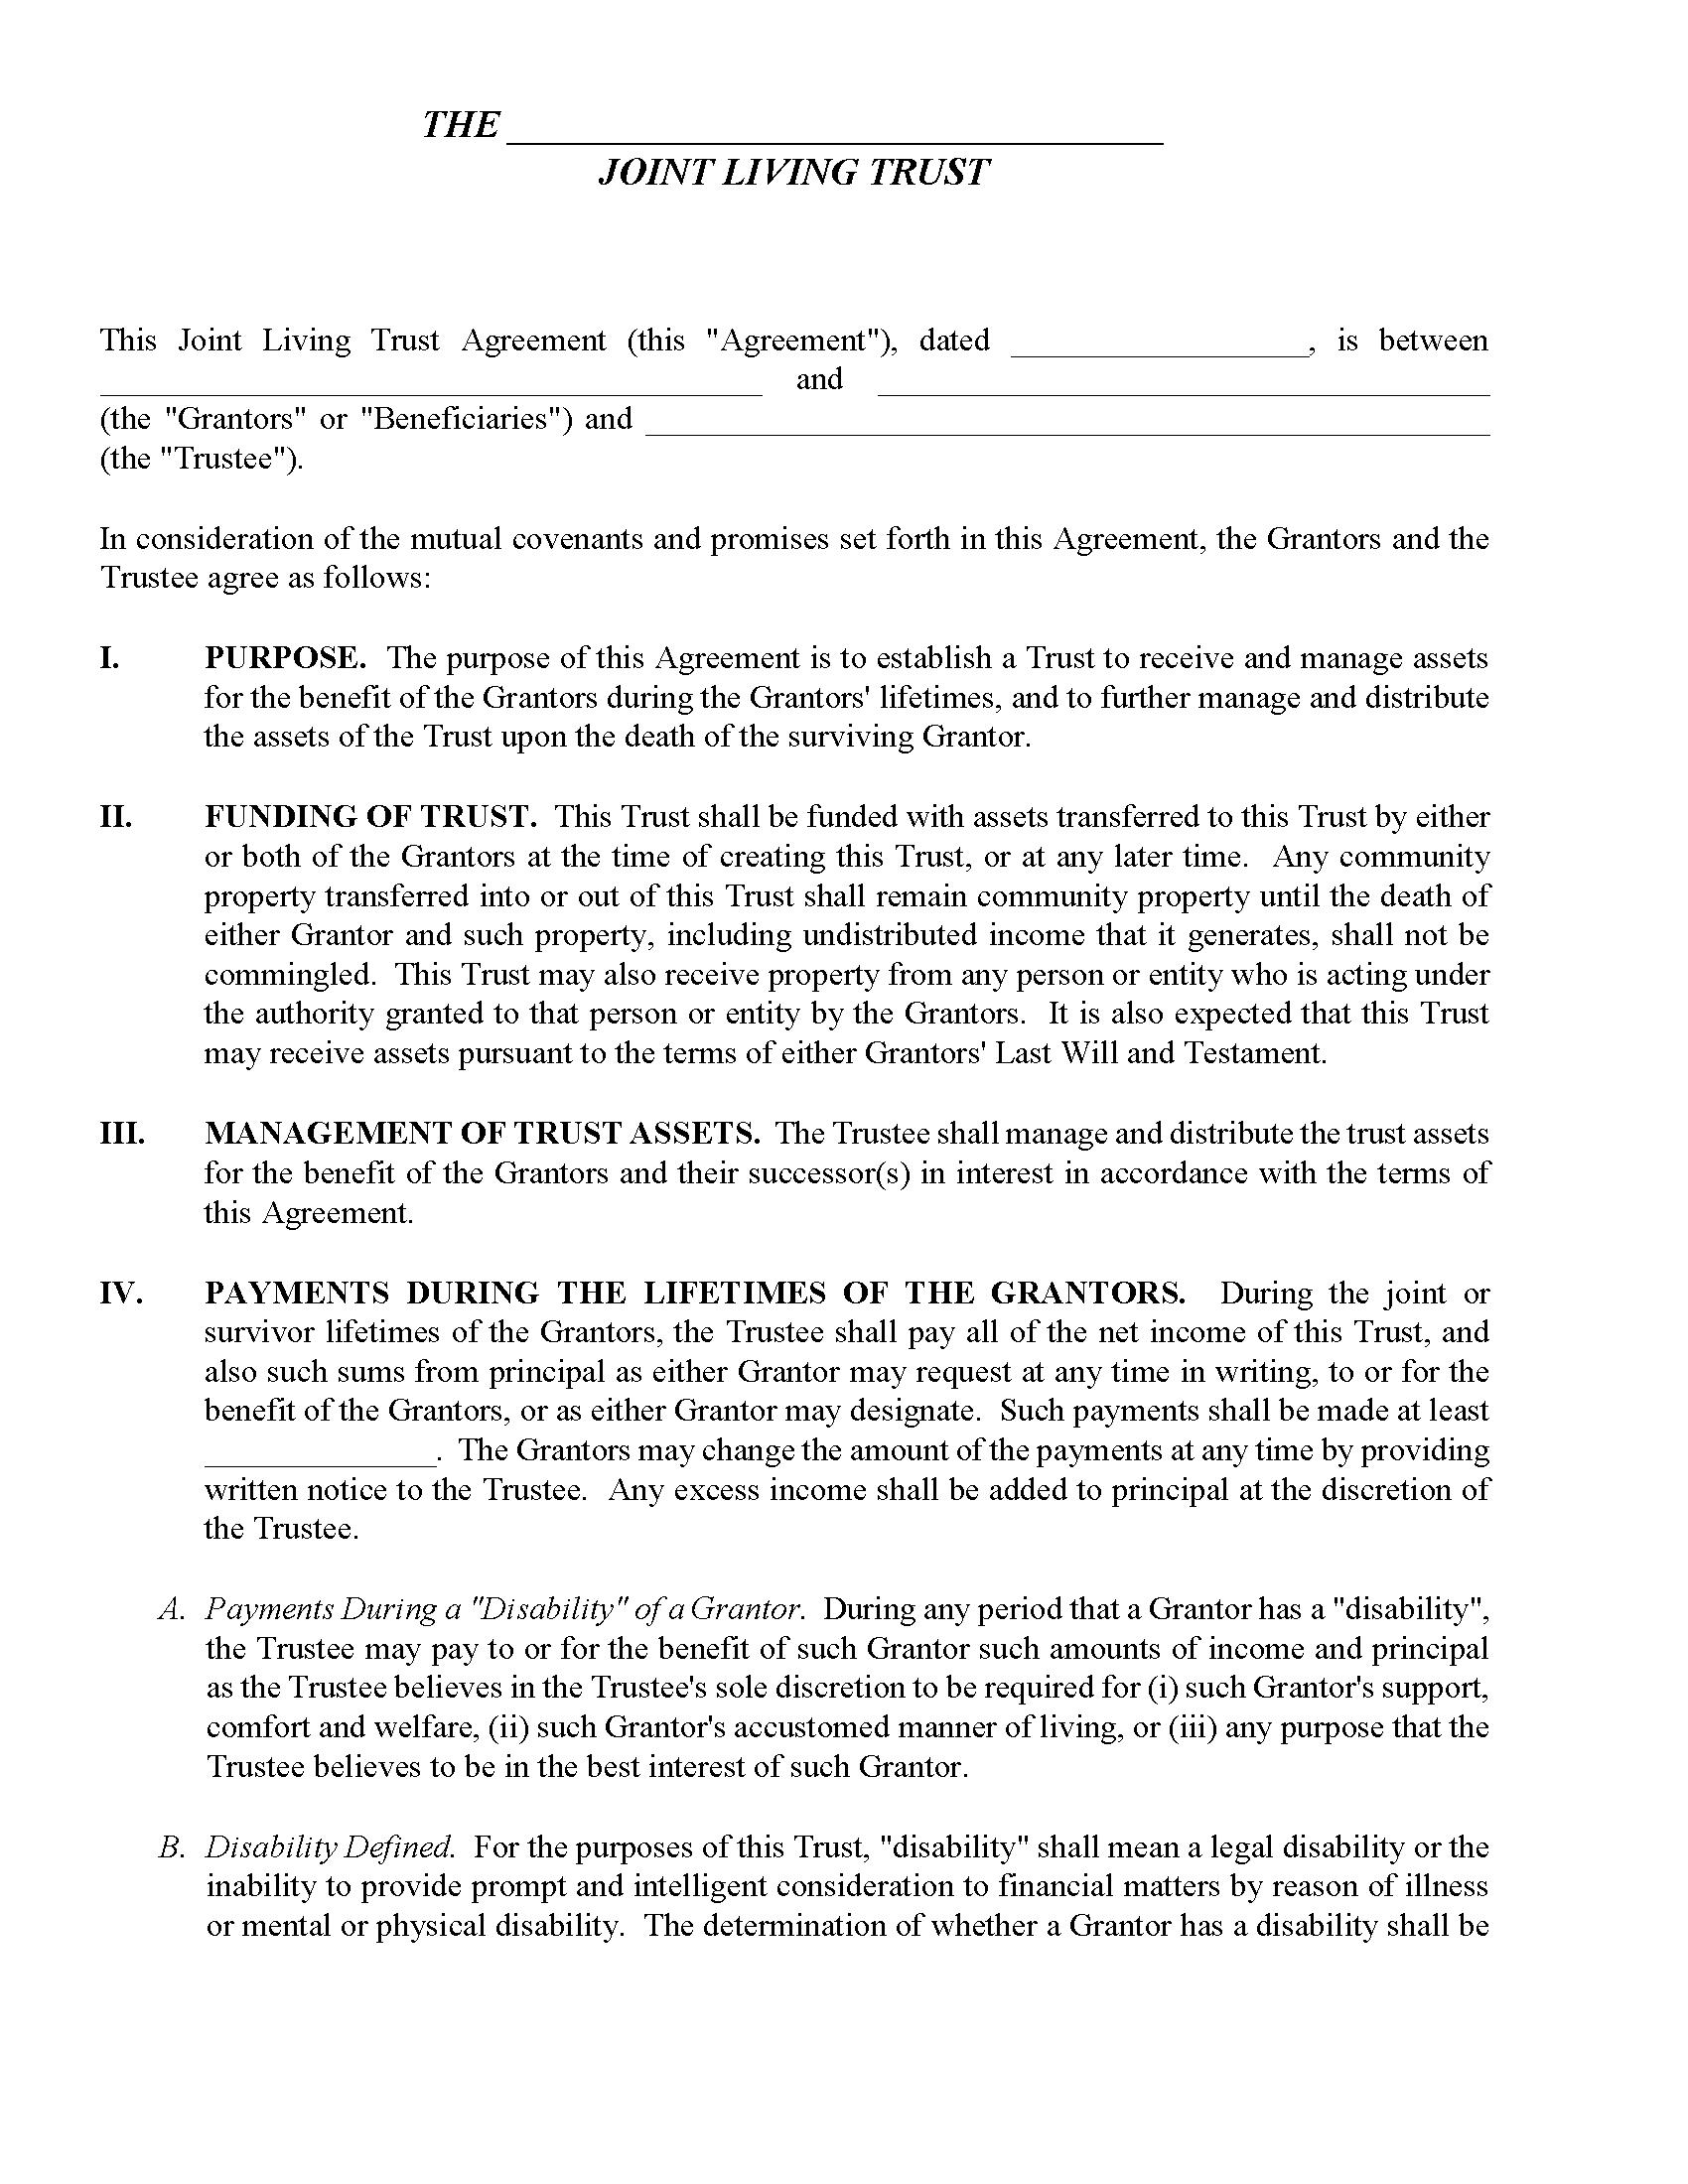 Delaware Joint Living Trust Form